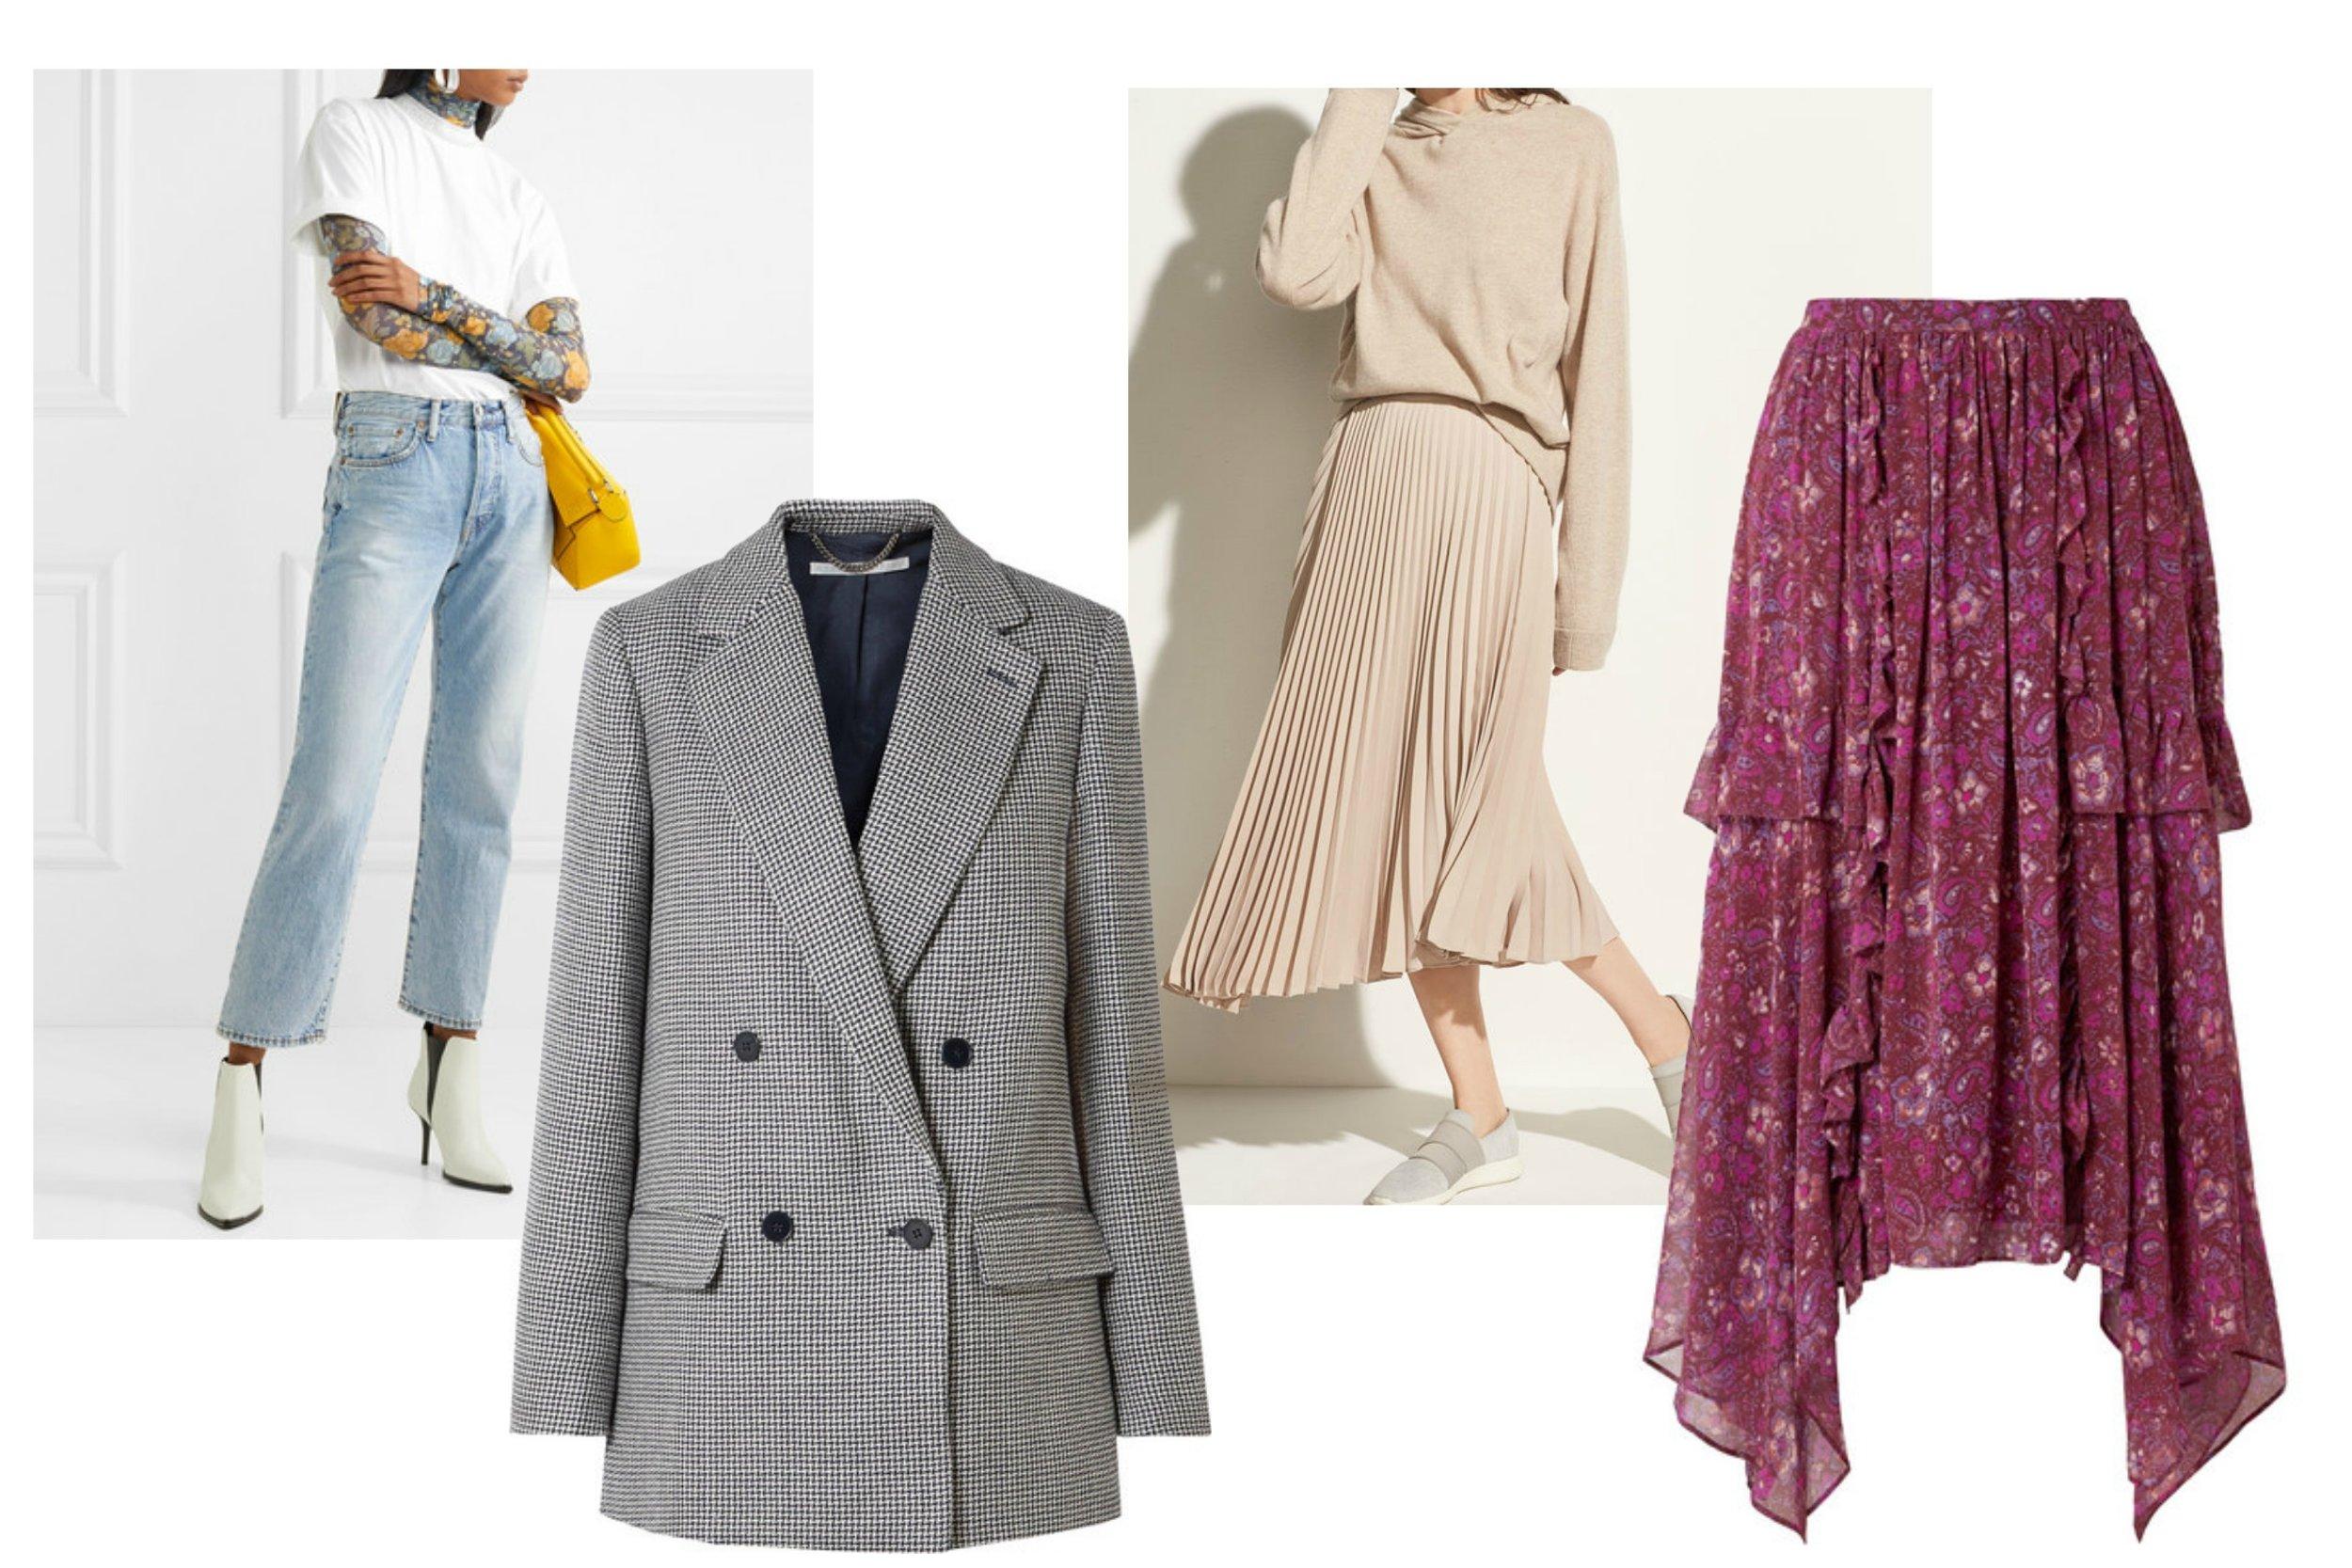 2018 Autumn Wardrobe | EvocativelyChosen.com